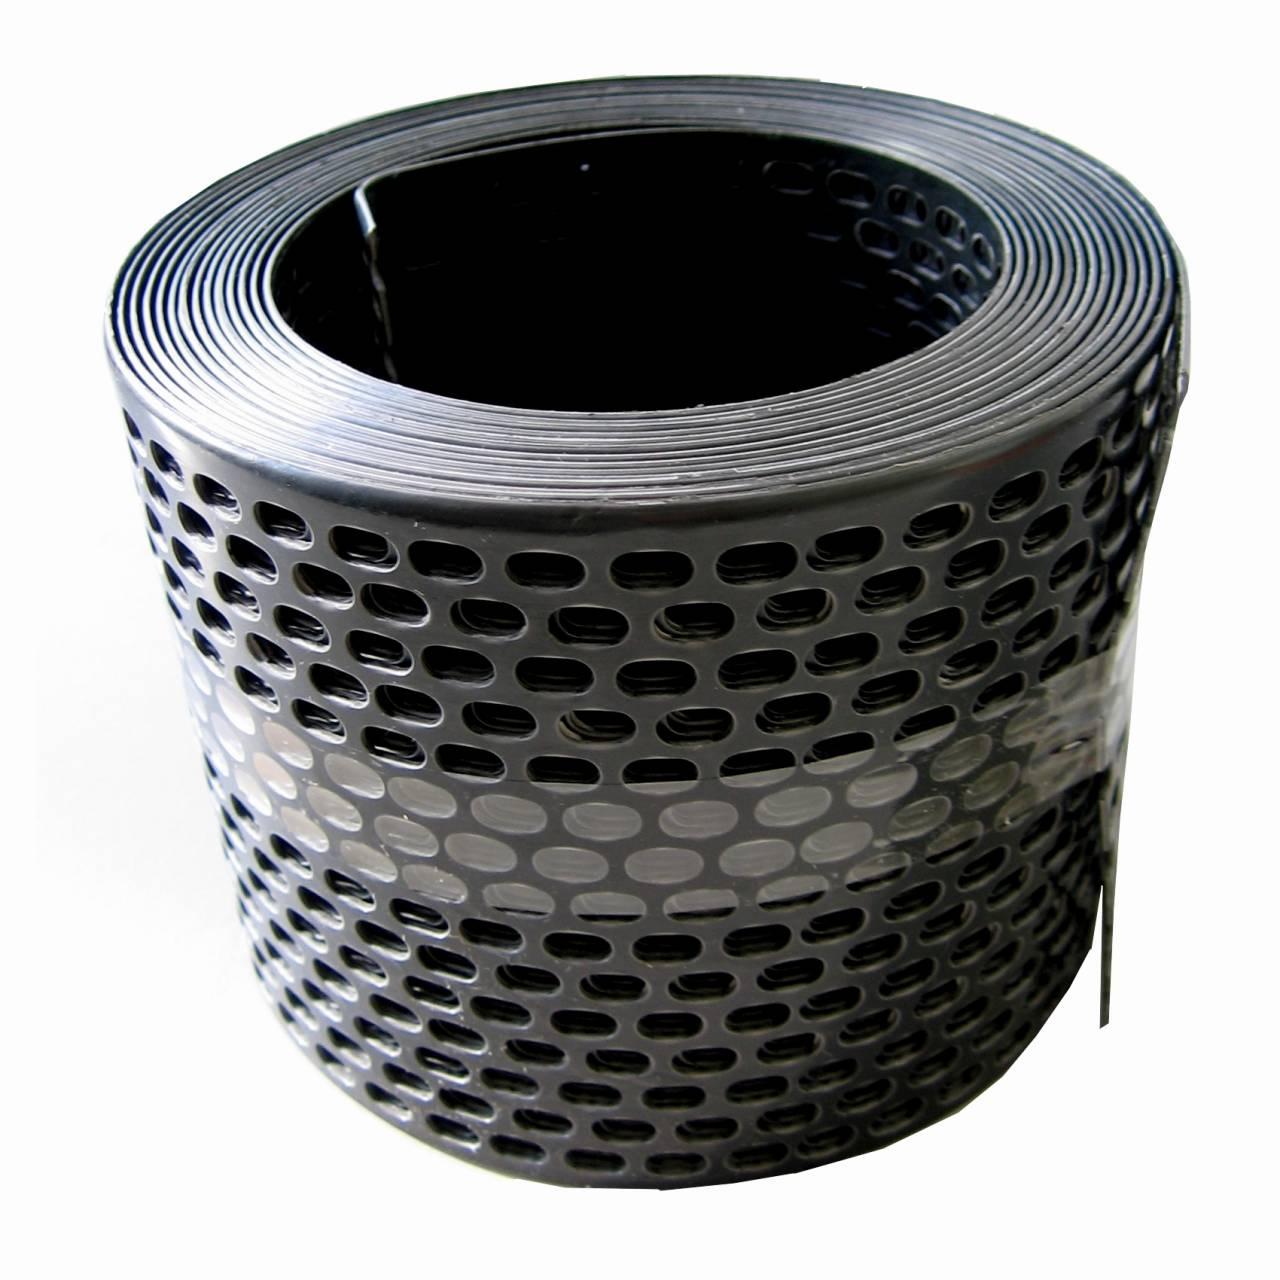 Traufgitter 50 mm schwarz / Rolle a 5 lfm